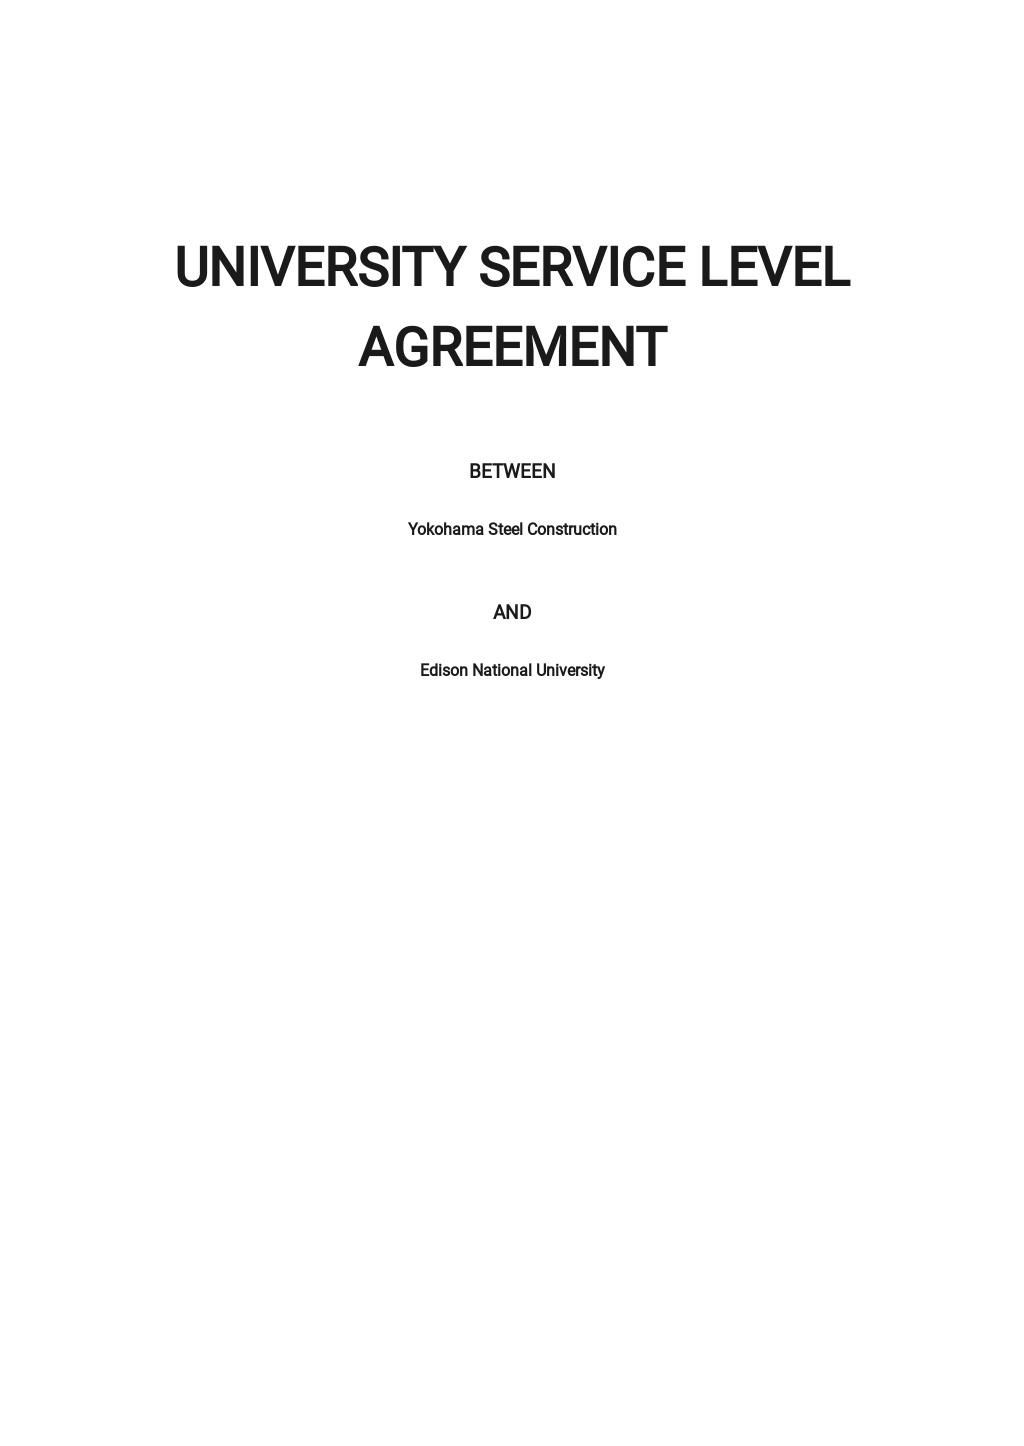 University Service Level Agreement Template.jpe